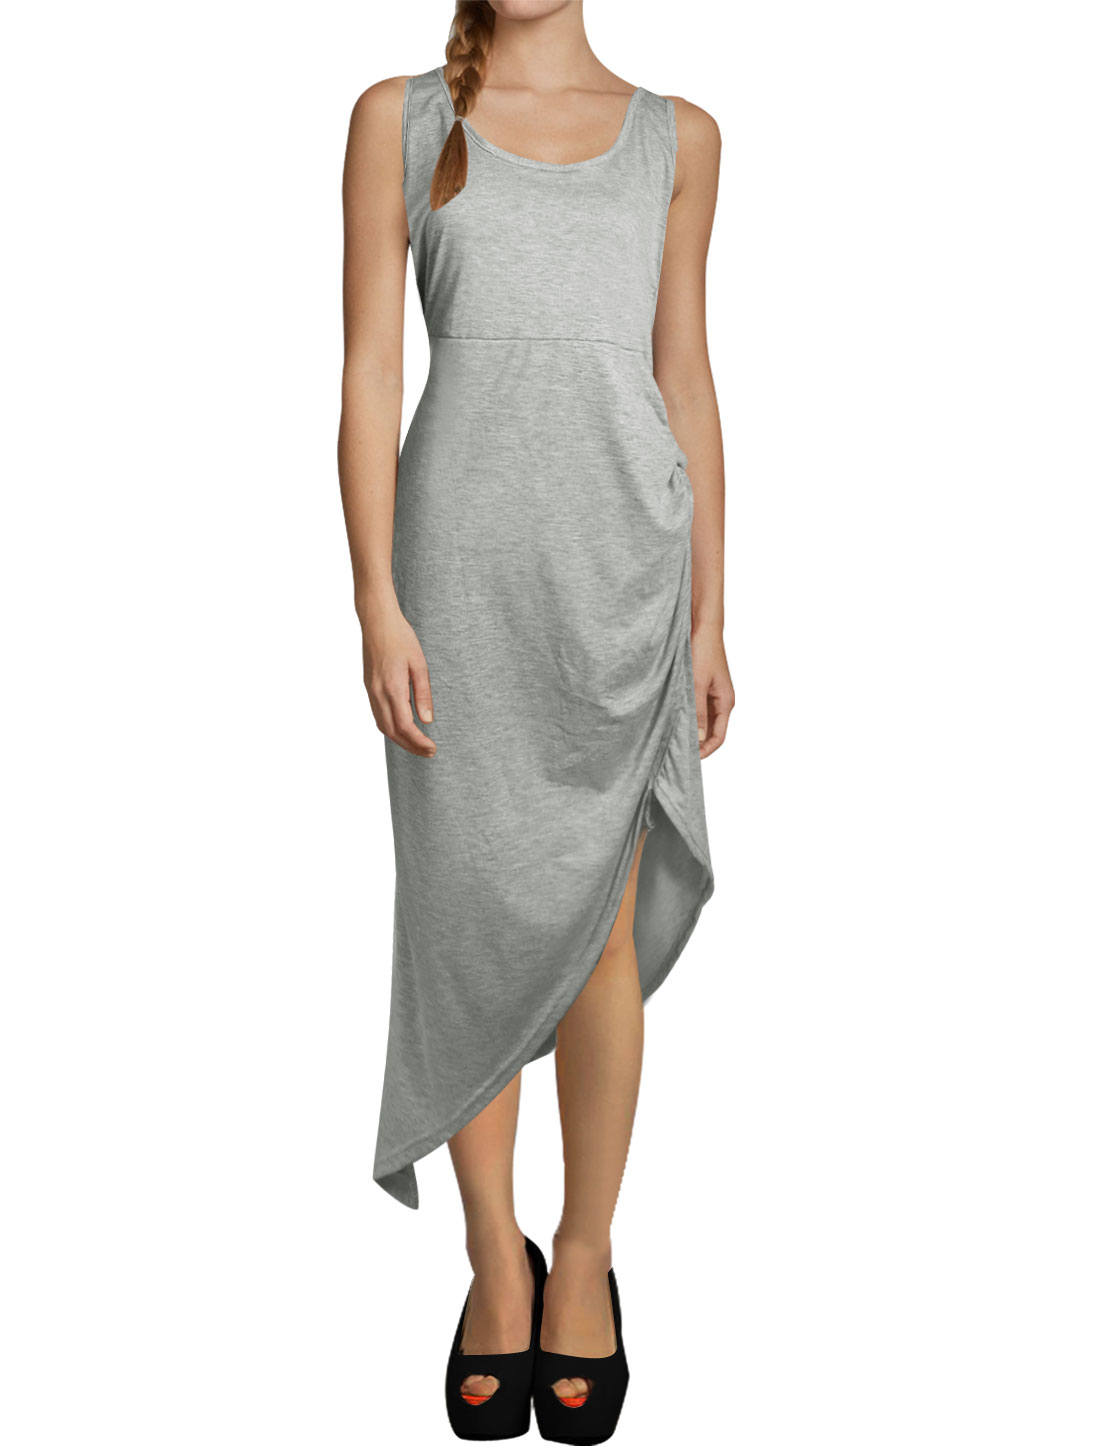 Women Scoop Neck Sleeveless Backless Asymmetric Hem Sheath Dress Light Gray L